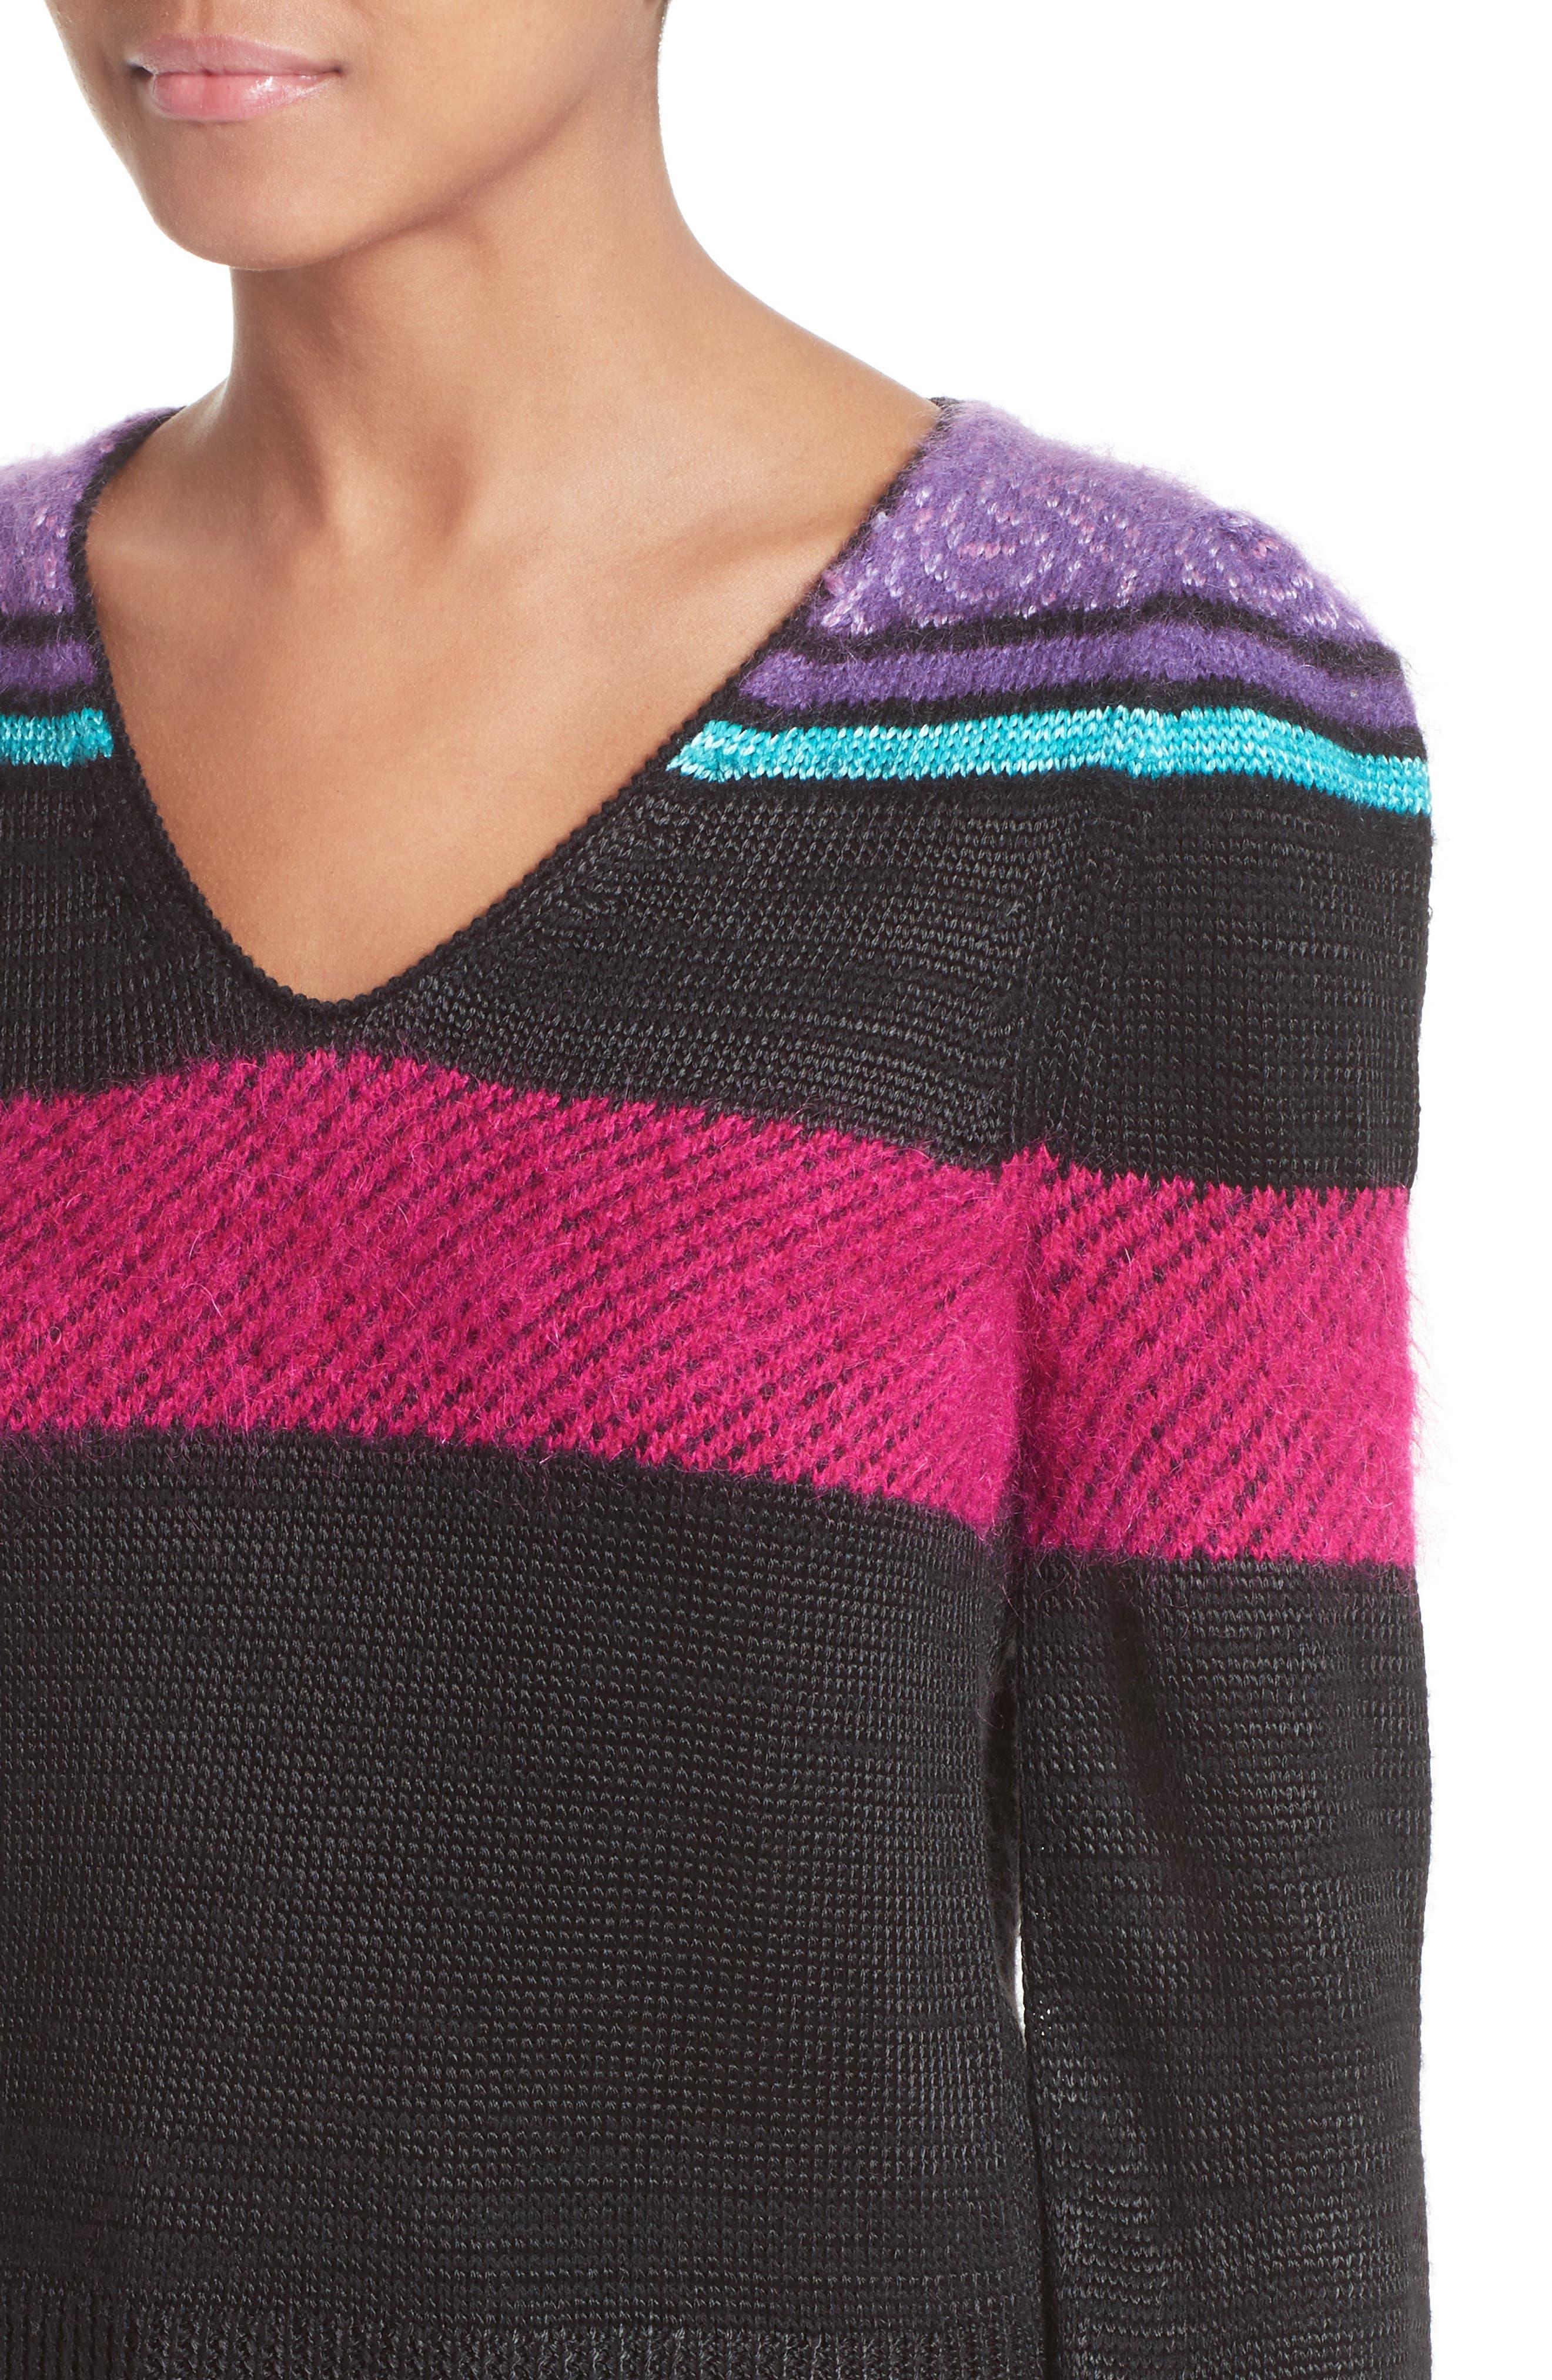 '80s Stripe Knit Sweater,                             Alternate thumbnail 4, color,                             002